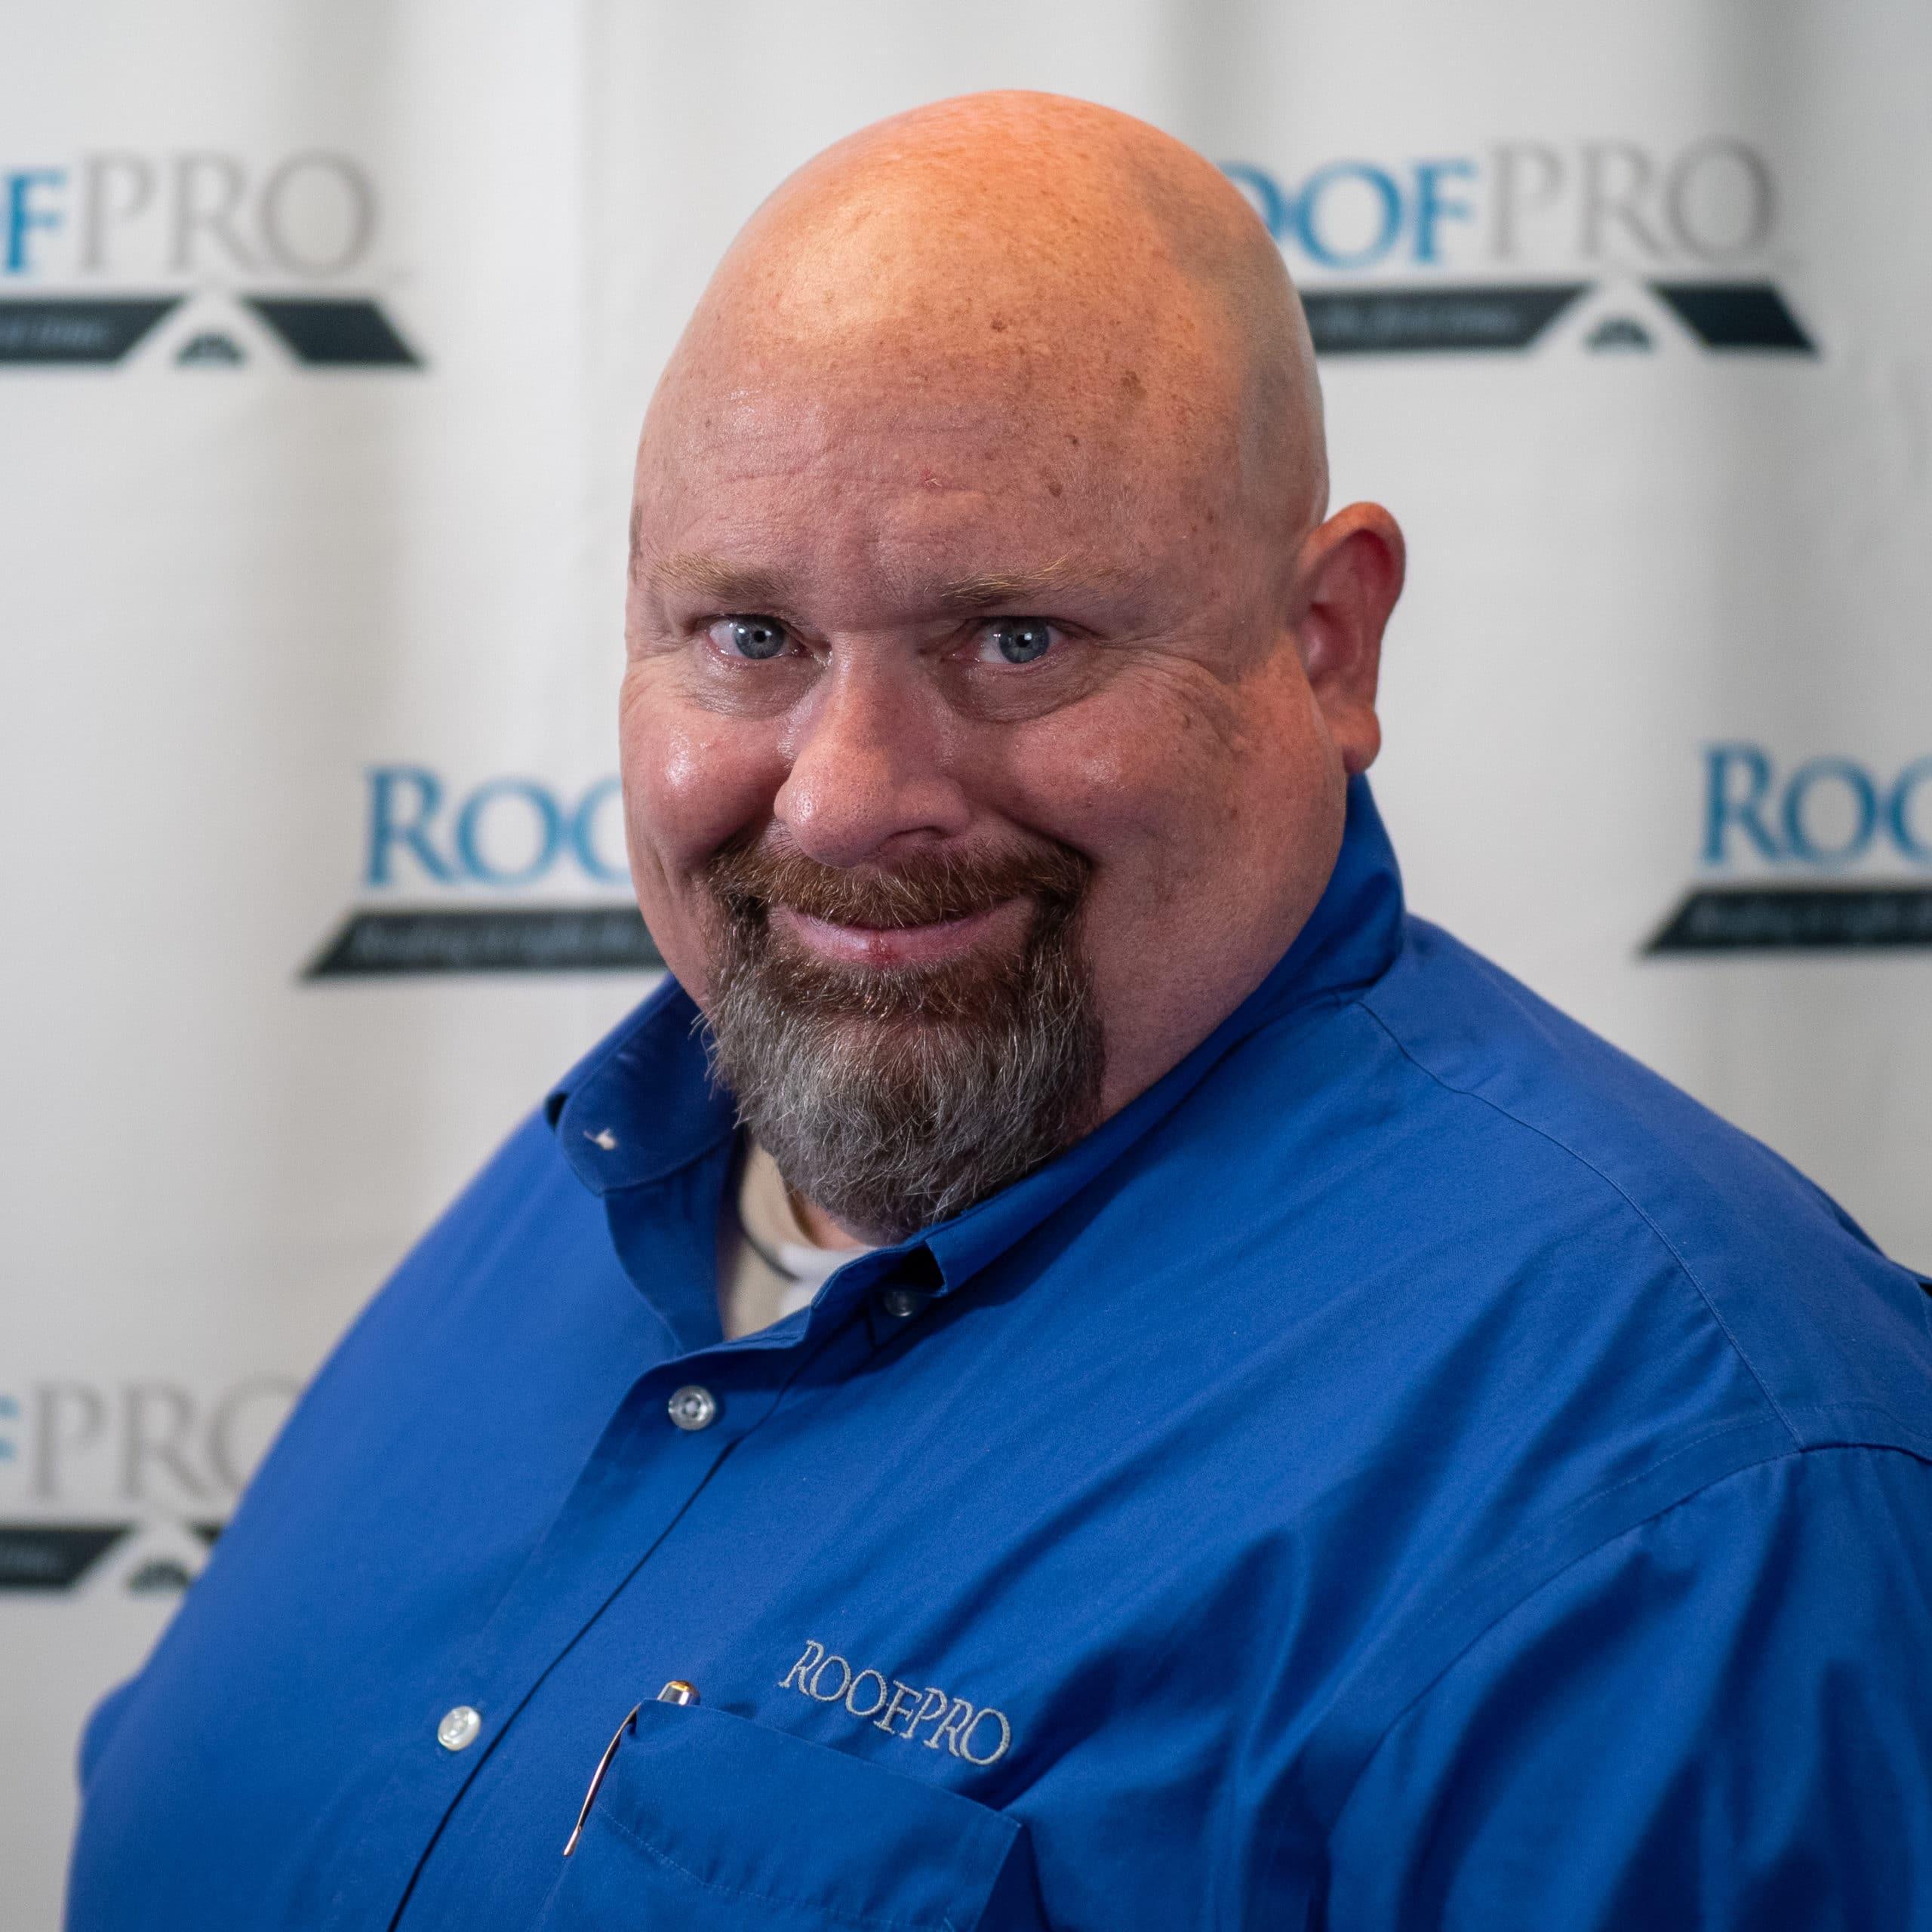 RoofPRO Company Photo